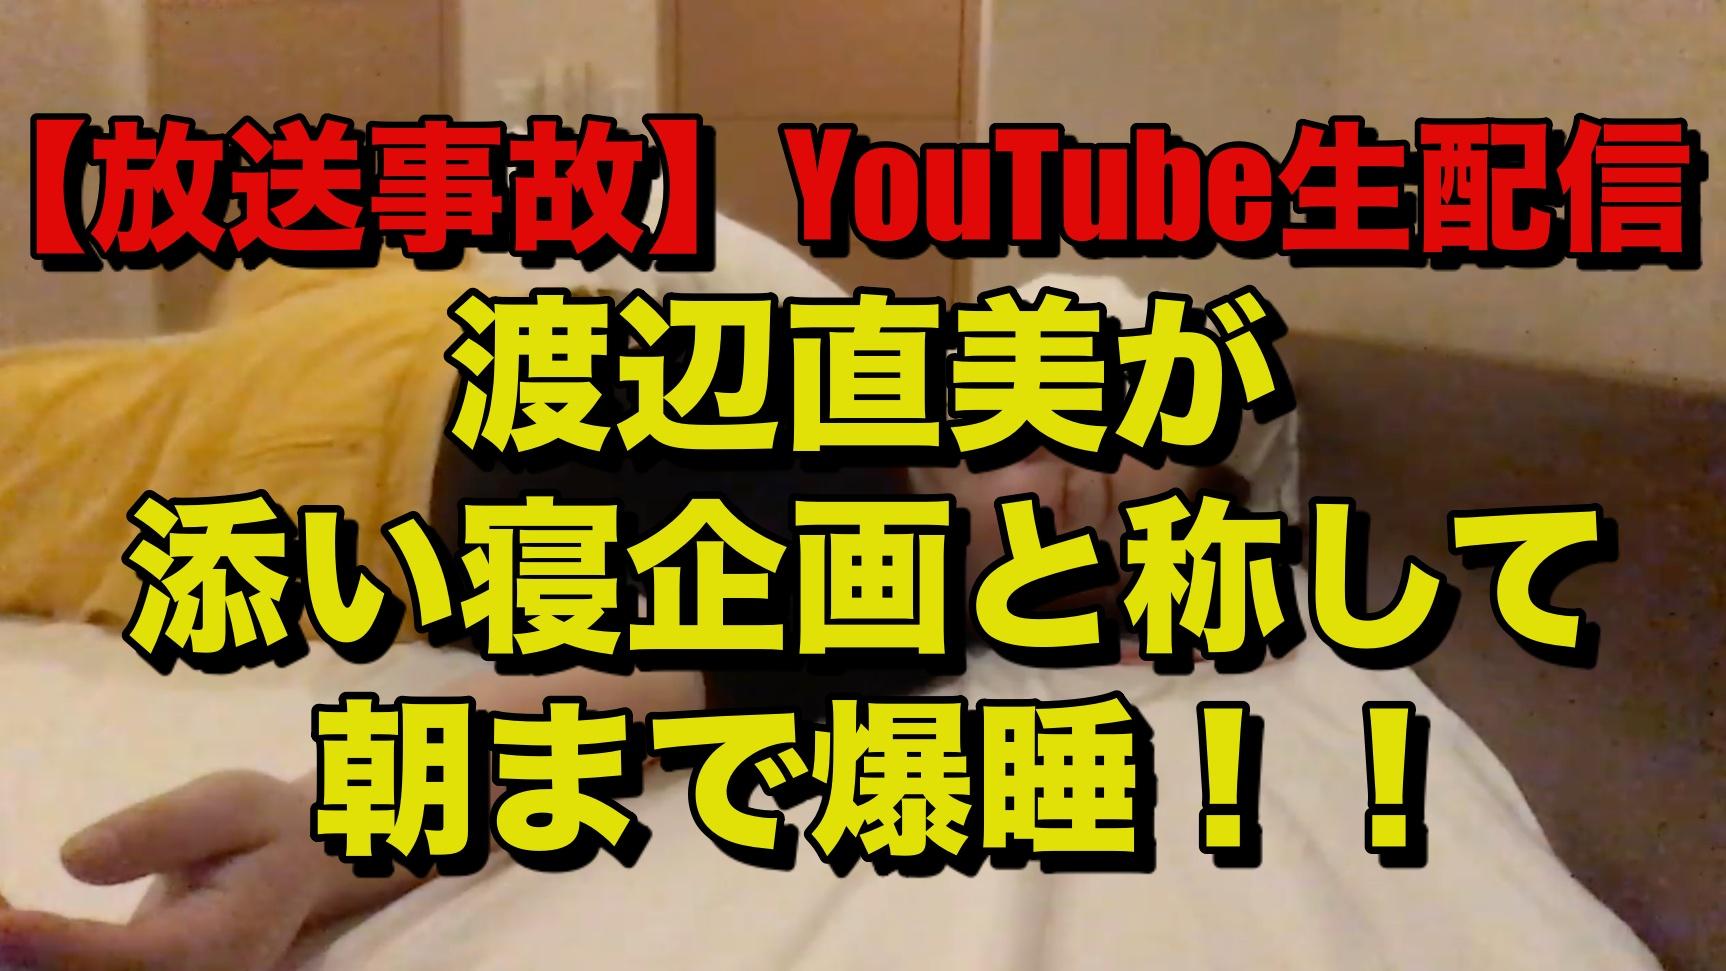 直美 youtube 渡辺